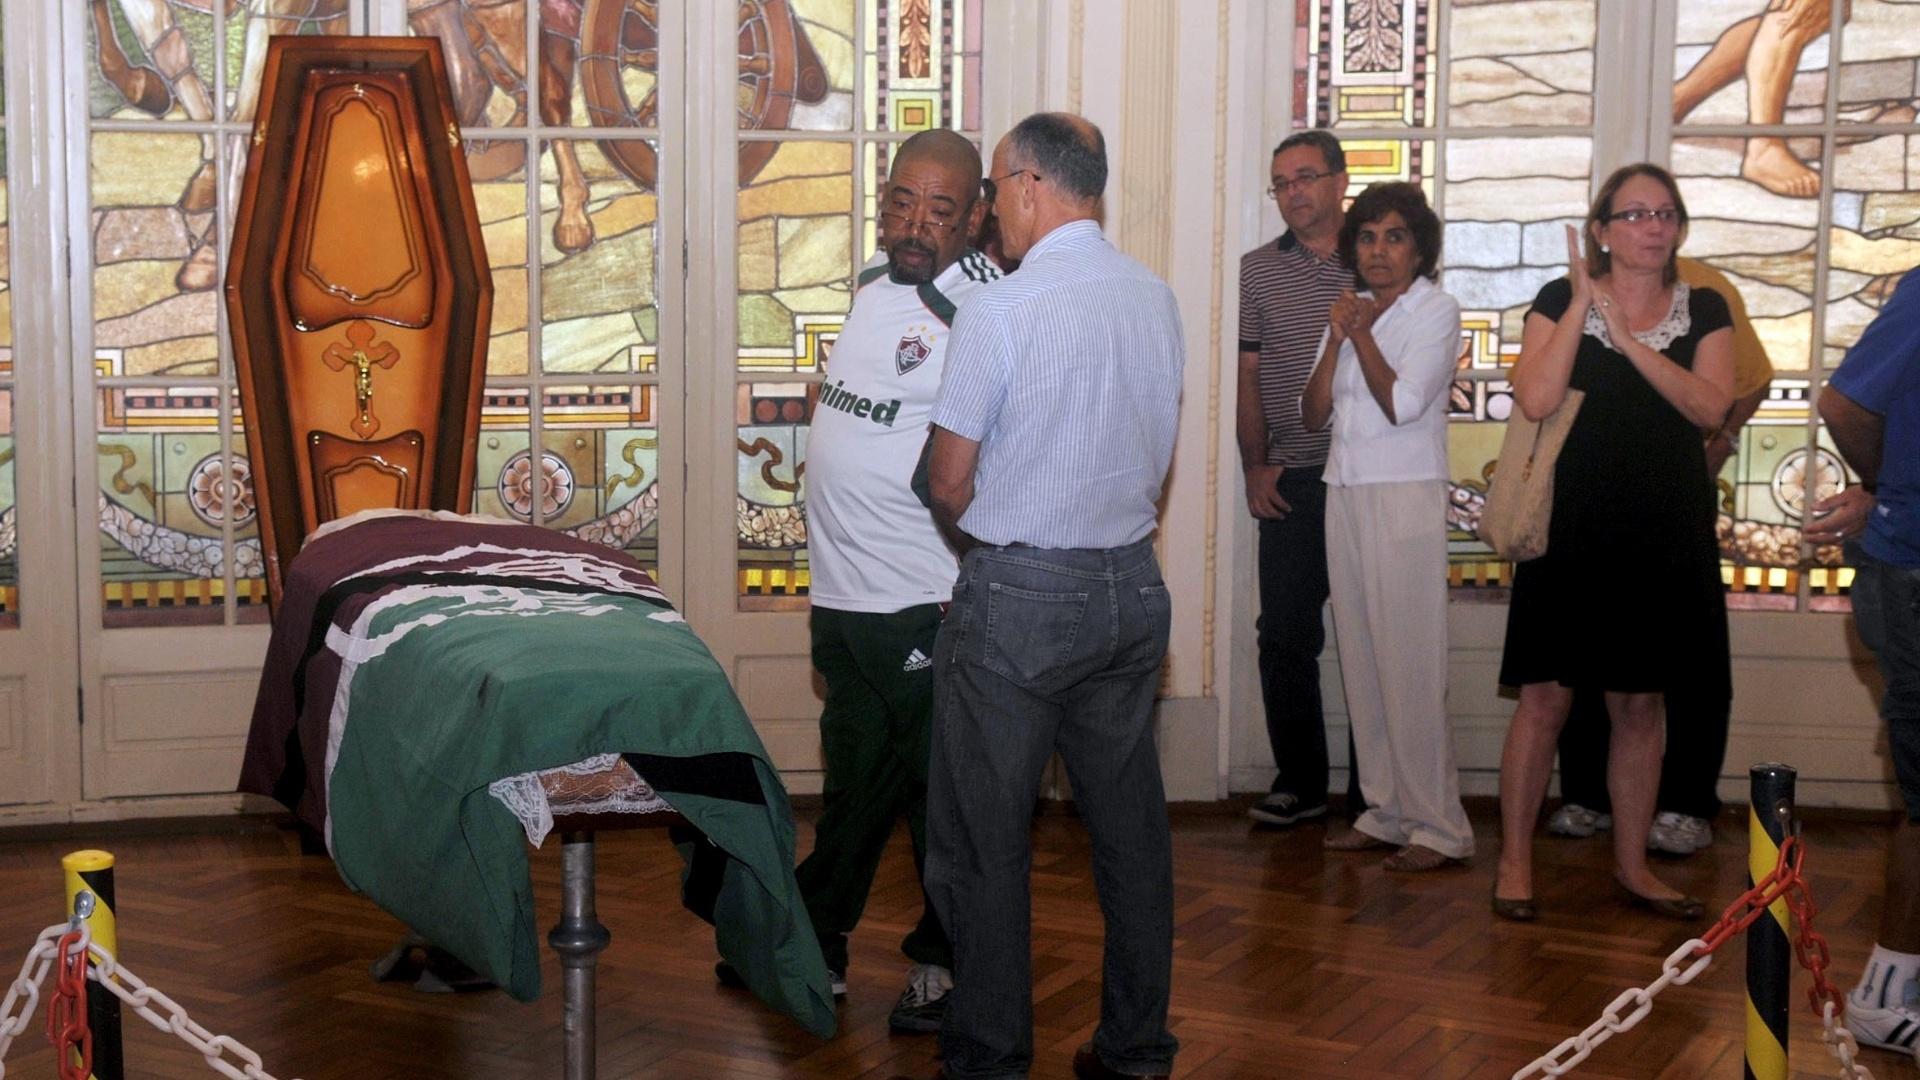 Velório do ex-atacante do Fluminense Ézio, no Salão Nobre das Laranjeiras